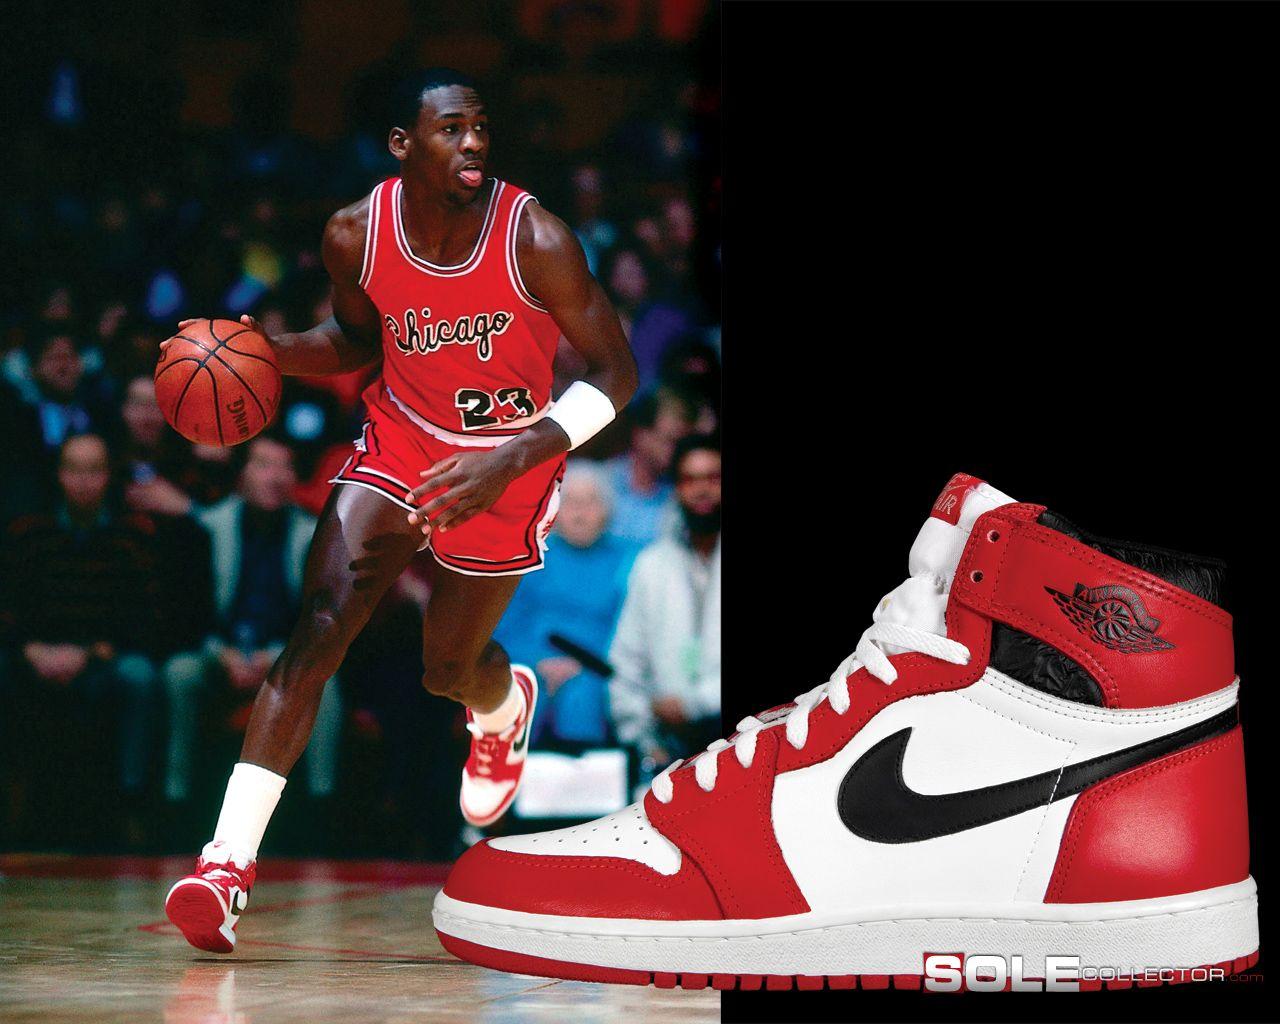 Nike Jordan Huarache Shoes Of Genealogy Air 1Mj The KFJcul3T1